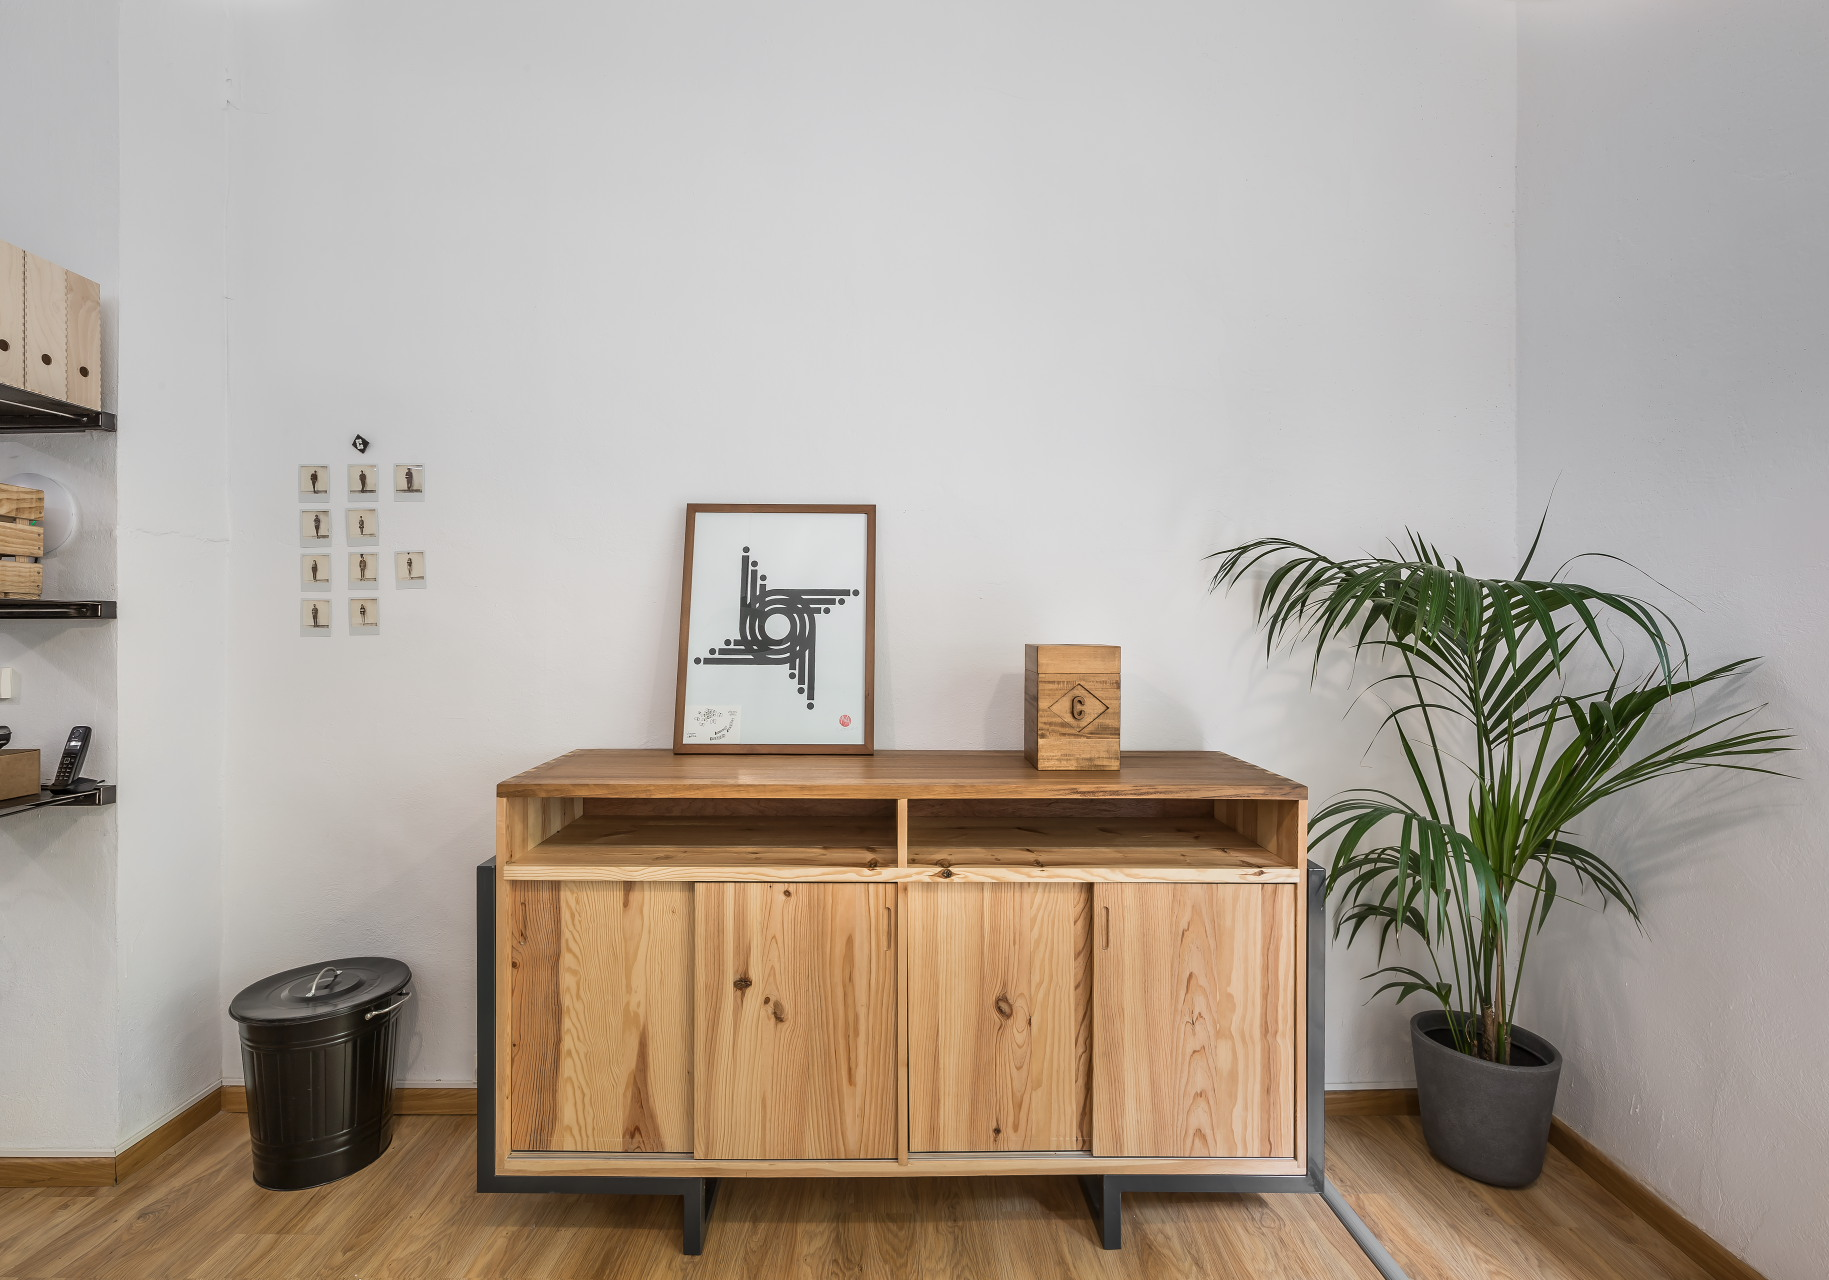 fotografia-arquitectura-interiorismo-valencia-german-cabo-boubau-carmencita-carmencitafilmlab (5)